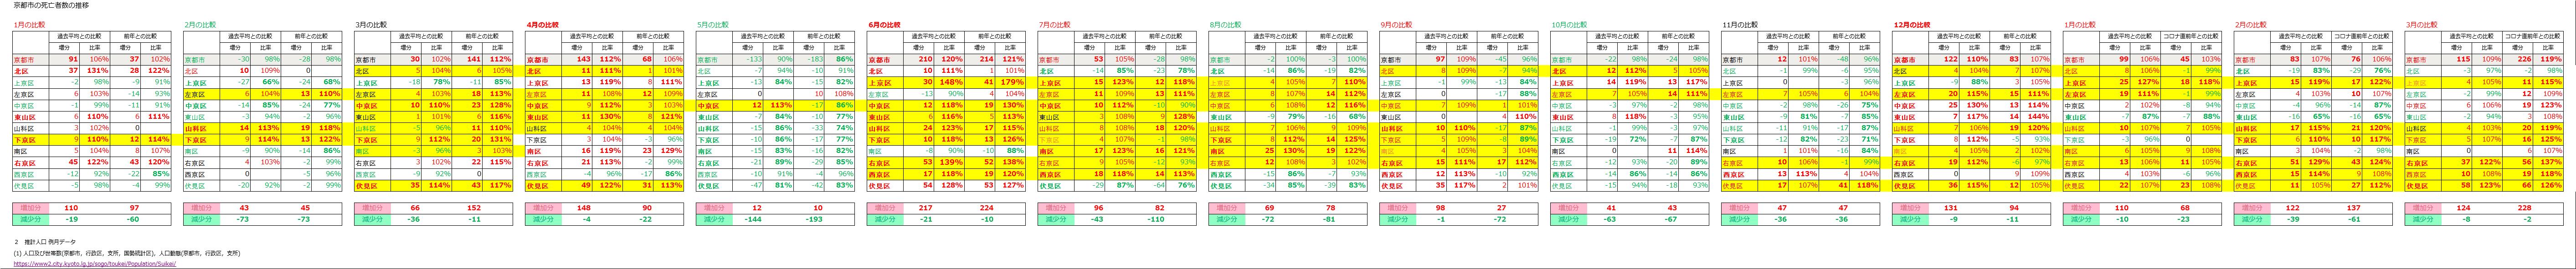 %E4%BA%AC%E9%83%BD%E5%B8%82%E6%AD%BB%E8%80%85%E6%AF%94%E8%BC%83.png